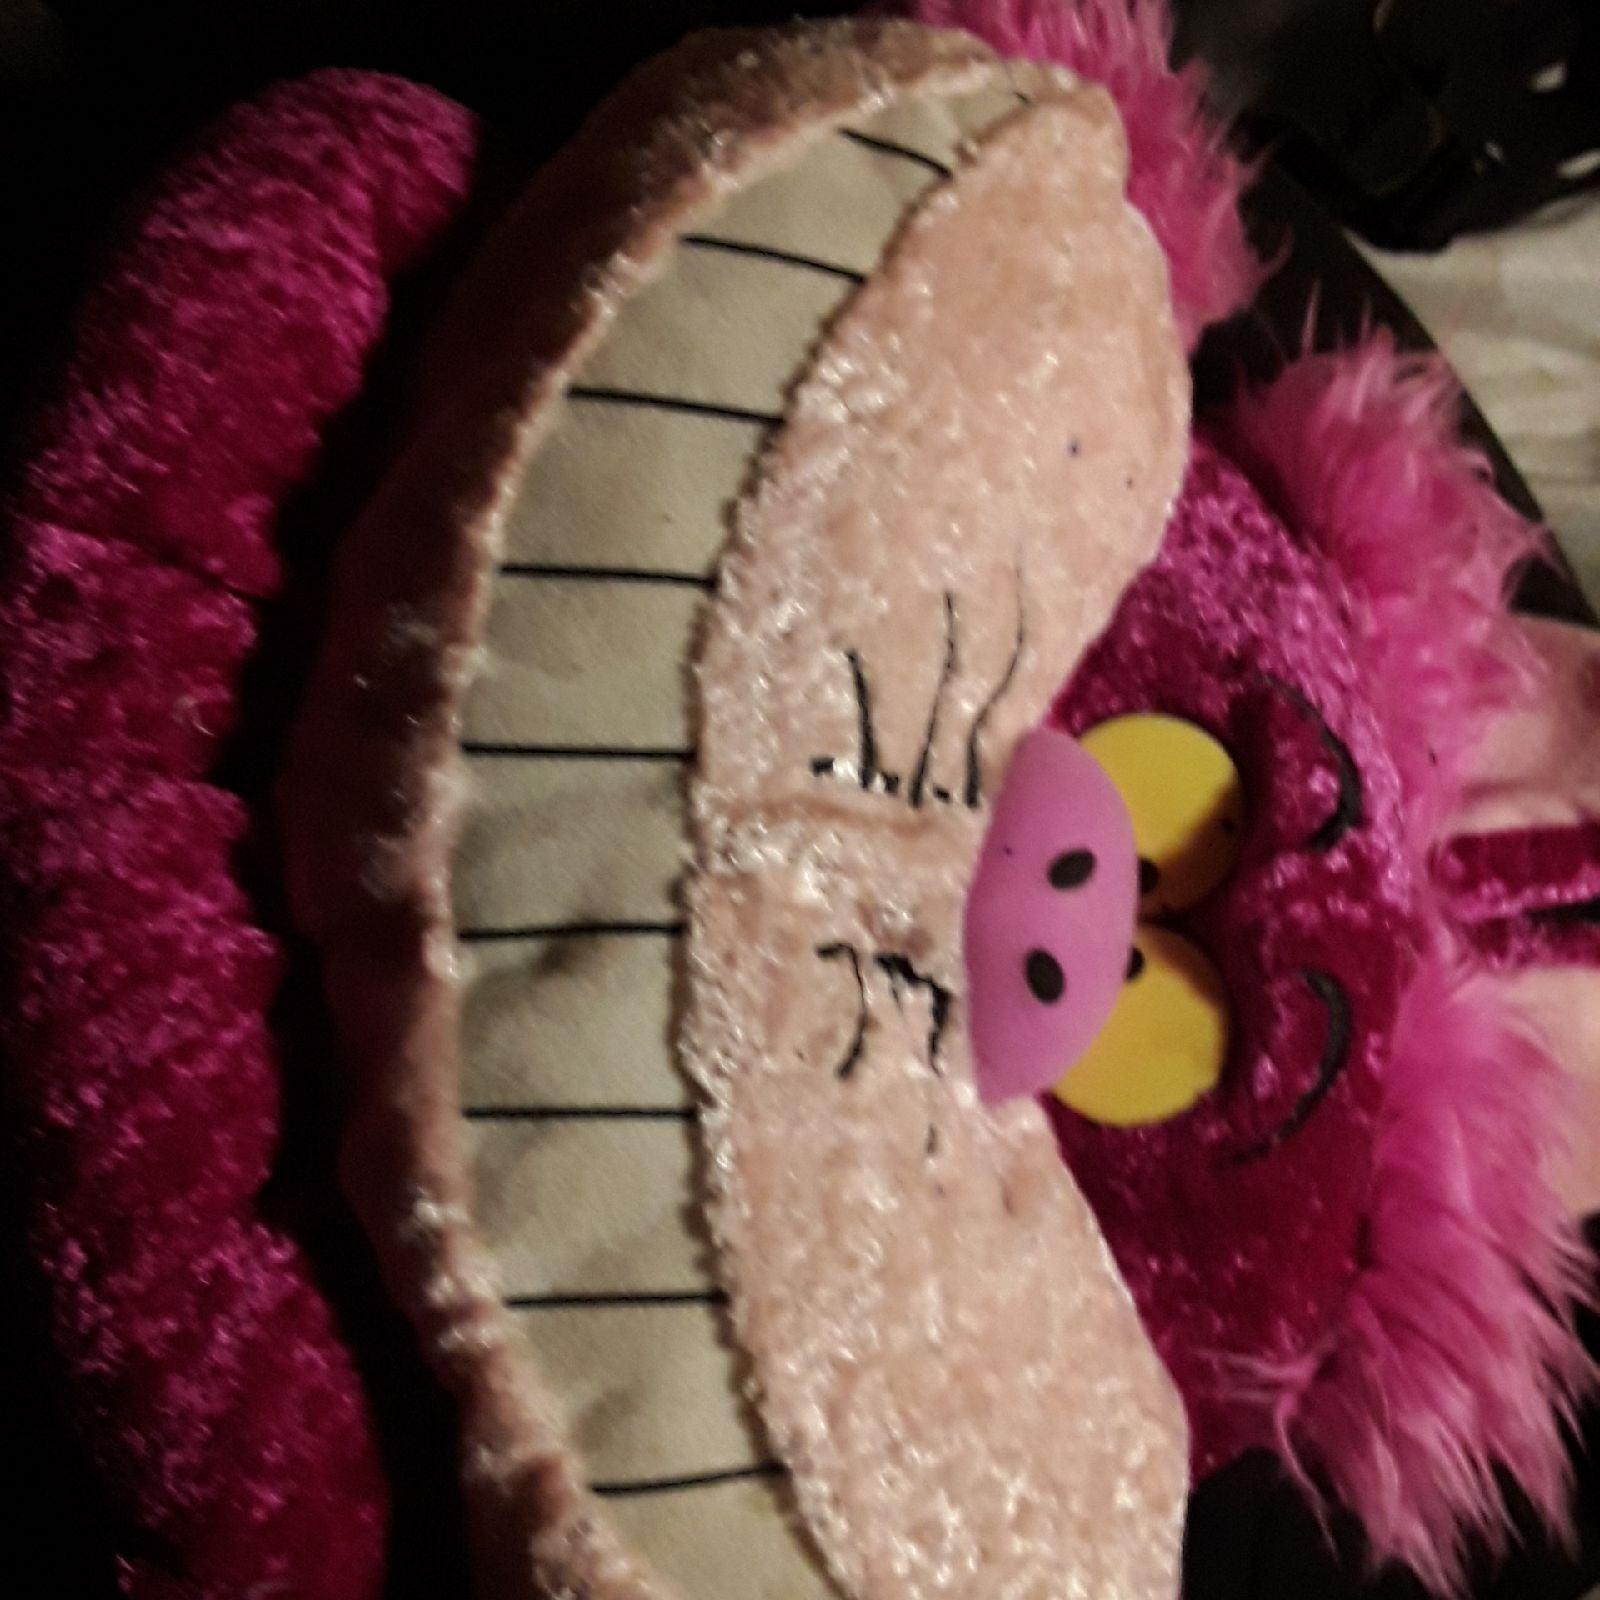 Alice in wonderland Cheshire cat top hat